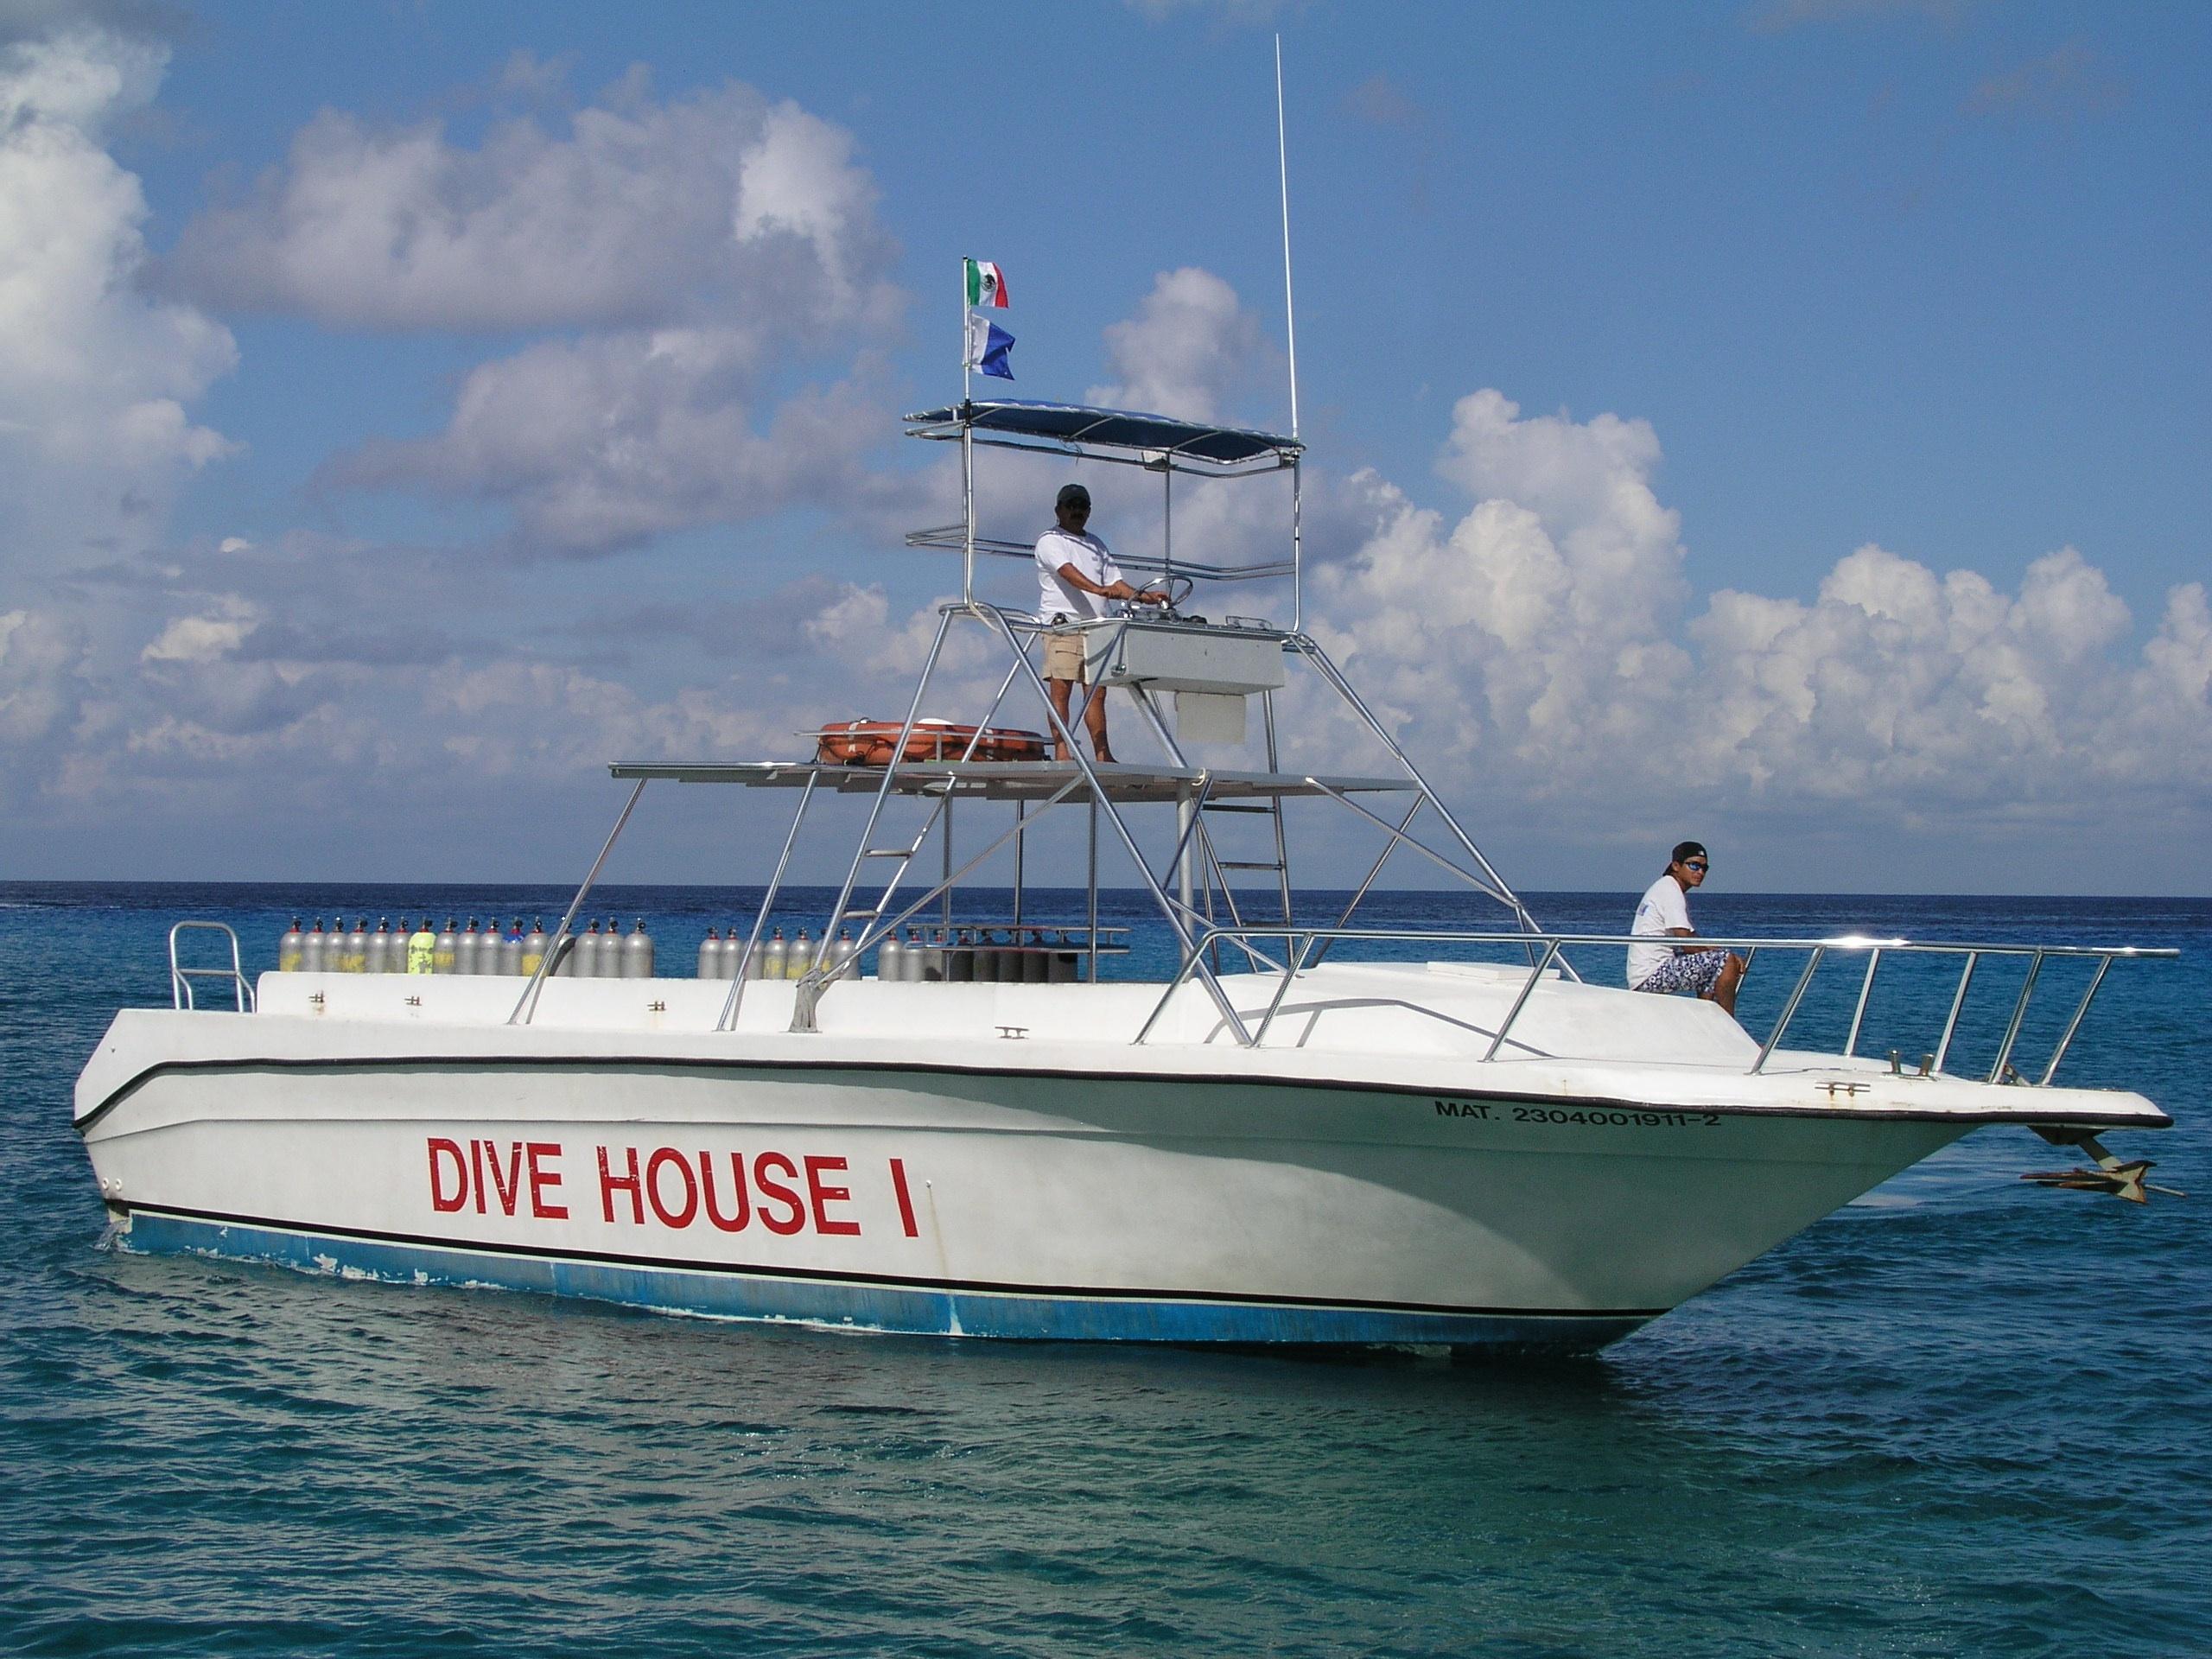 Dive House I